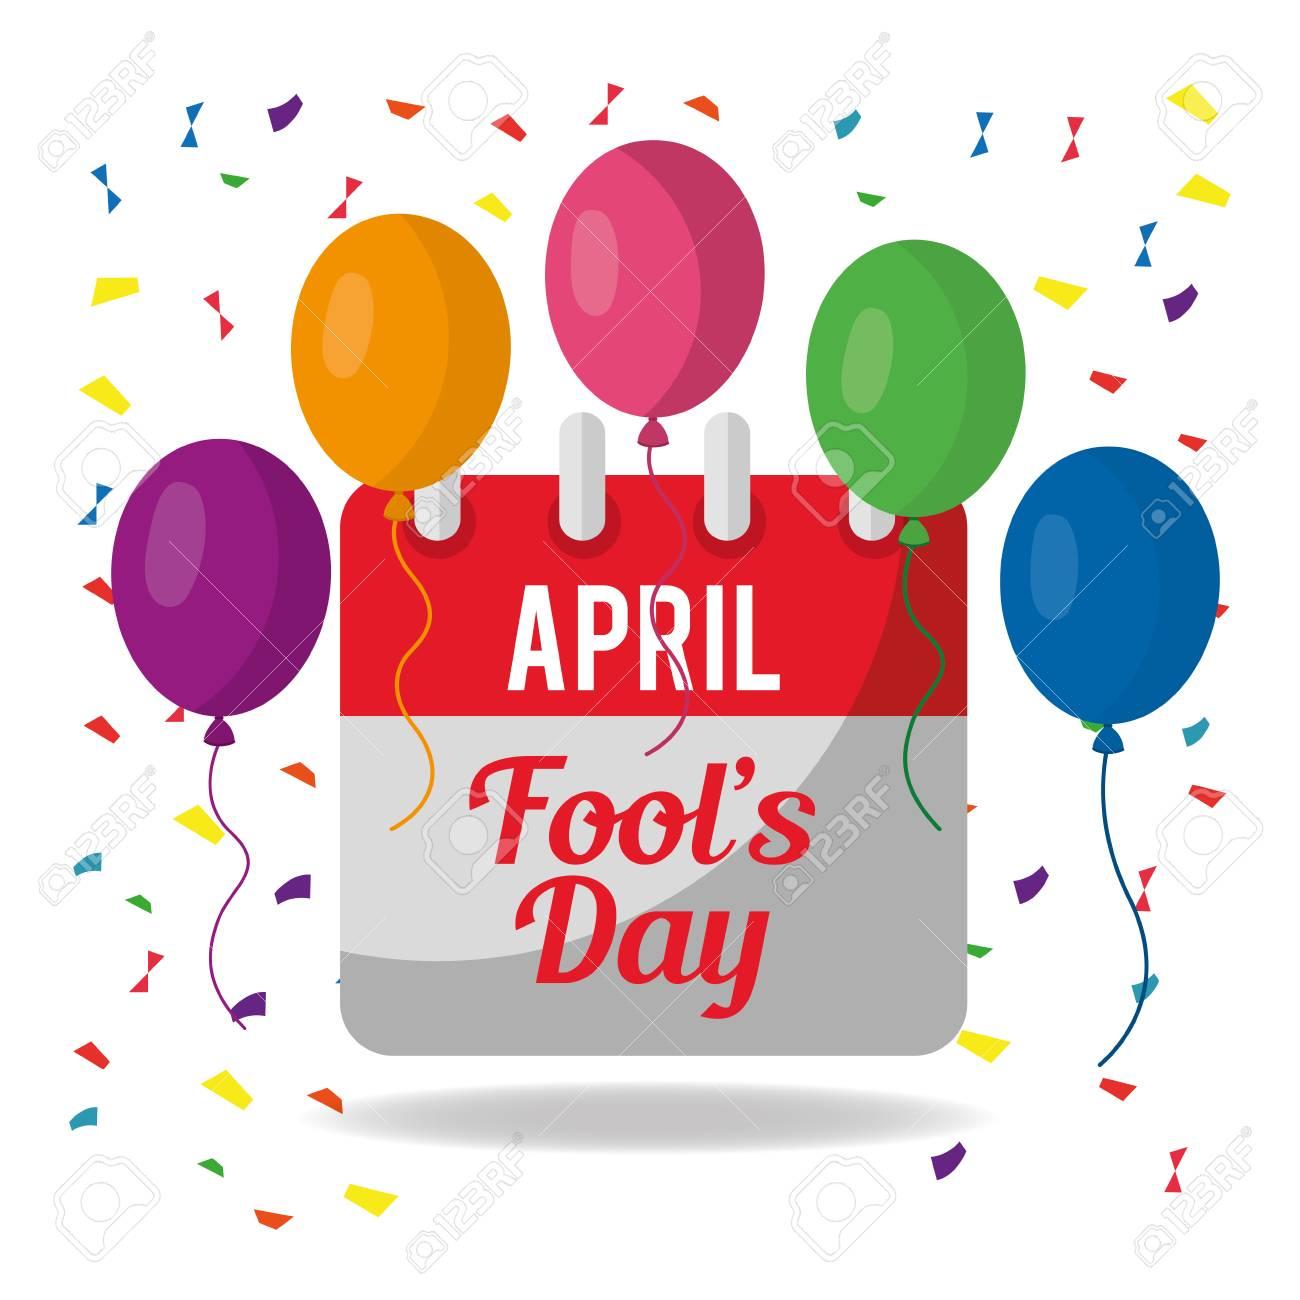 April Fools Day Festive Celebration Calendar Balloons Confetti Vector  Illustration Royalty Free Cliparts, Vectors, And Stock Illustration. Image  95108755.